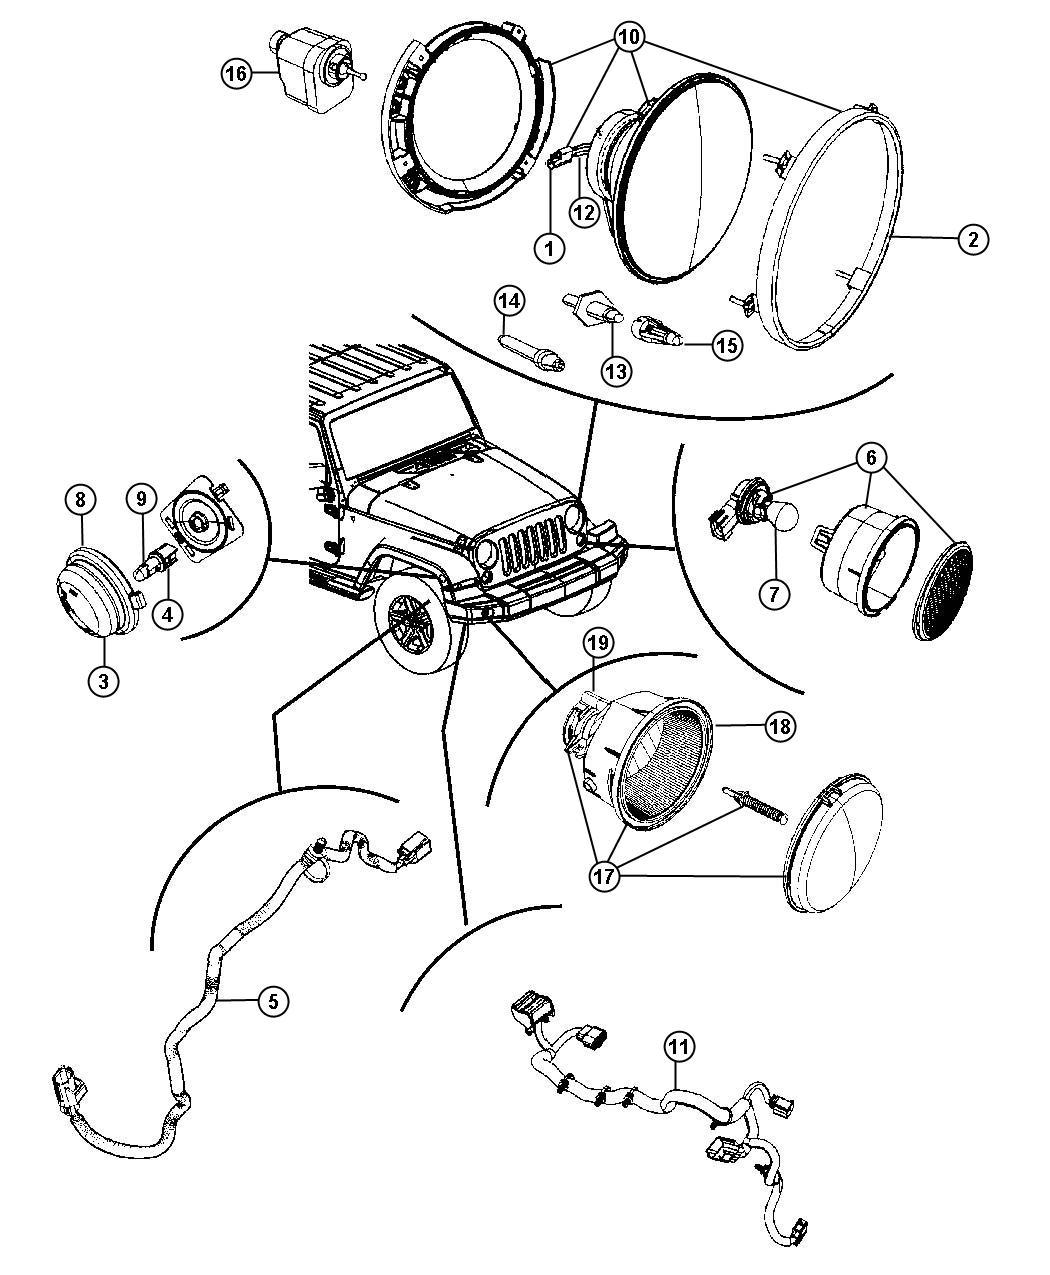 Jeep Wrangler Wiring. Headlamp. Export. Electrical, dash